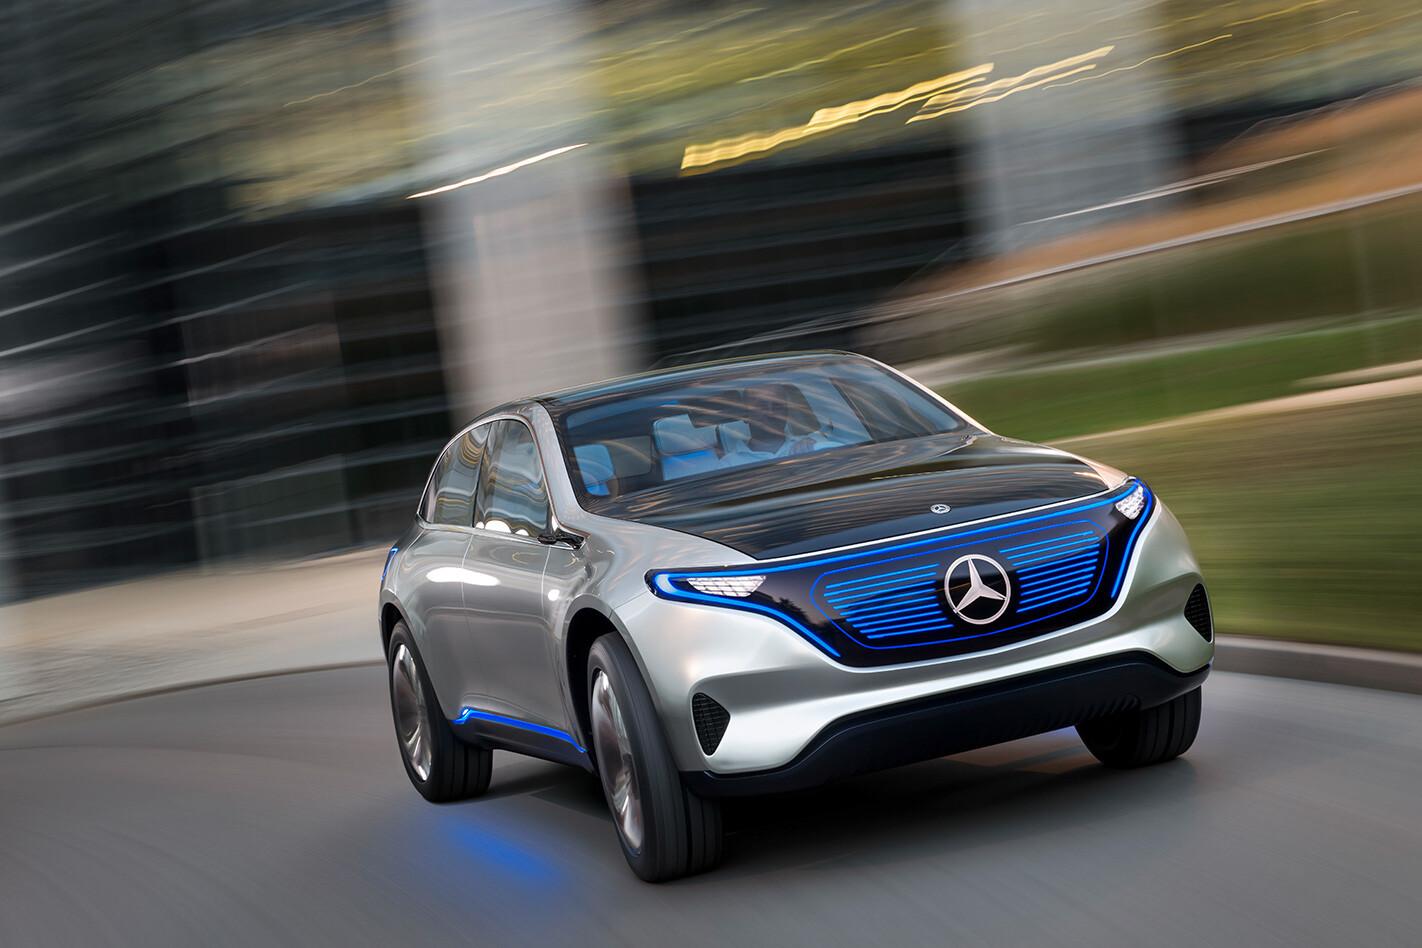 Mercedes Generation Eq Concept Paris Motor Show Jpg